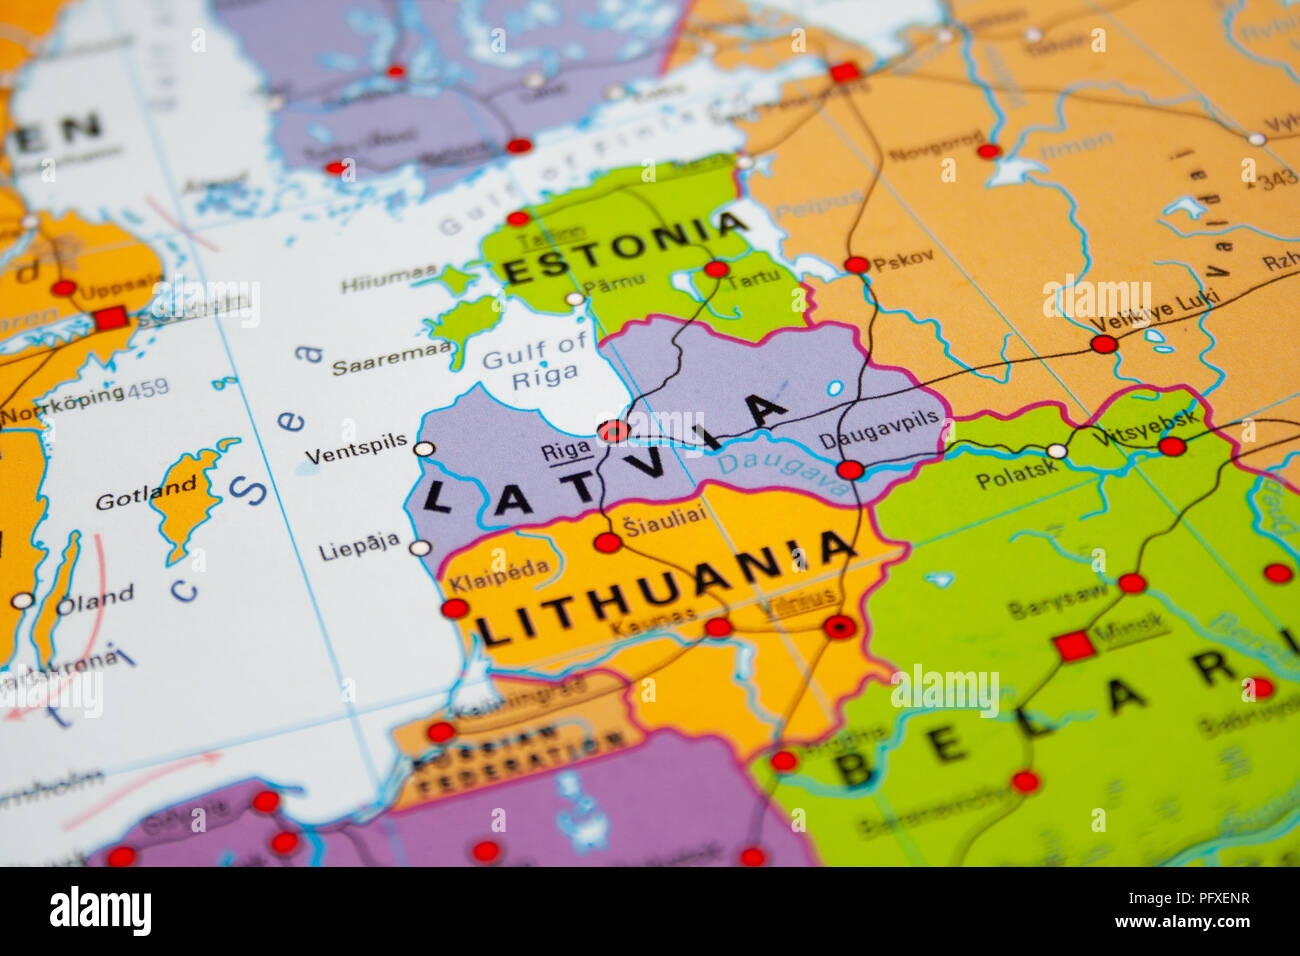 Map Of Latvia Stock Photos & Map Of Latvia Stock Images - Alamy